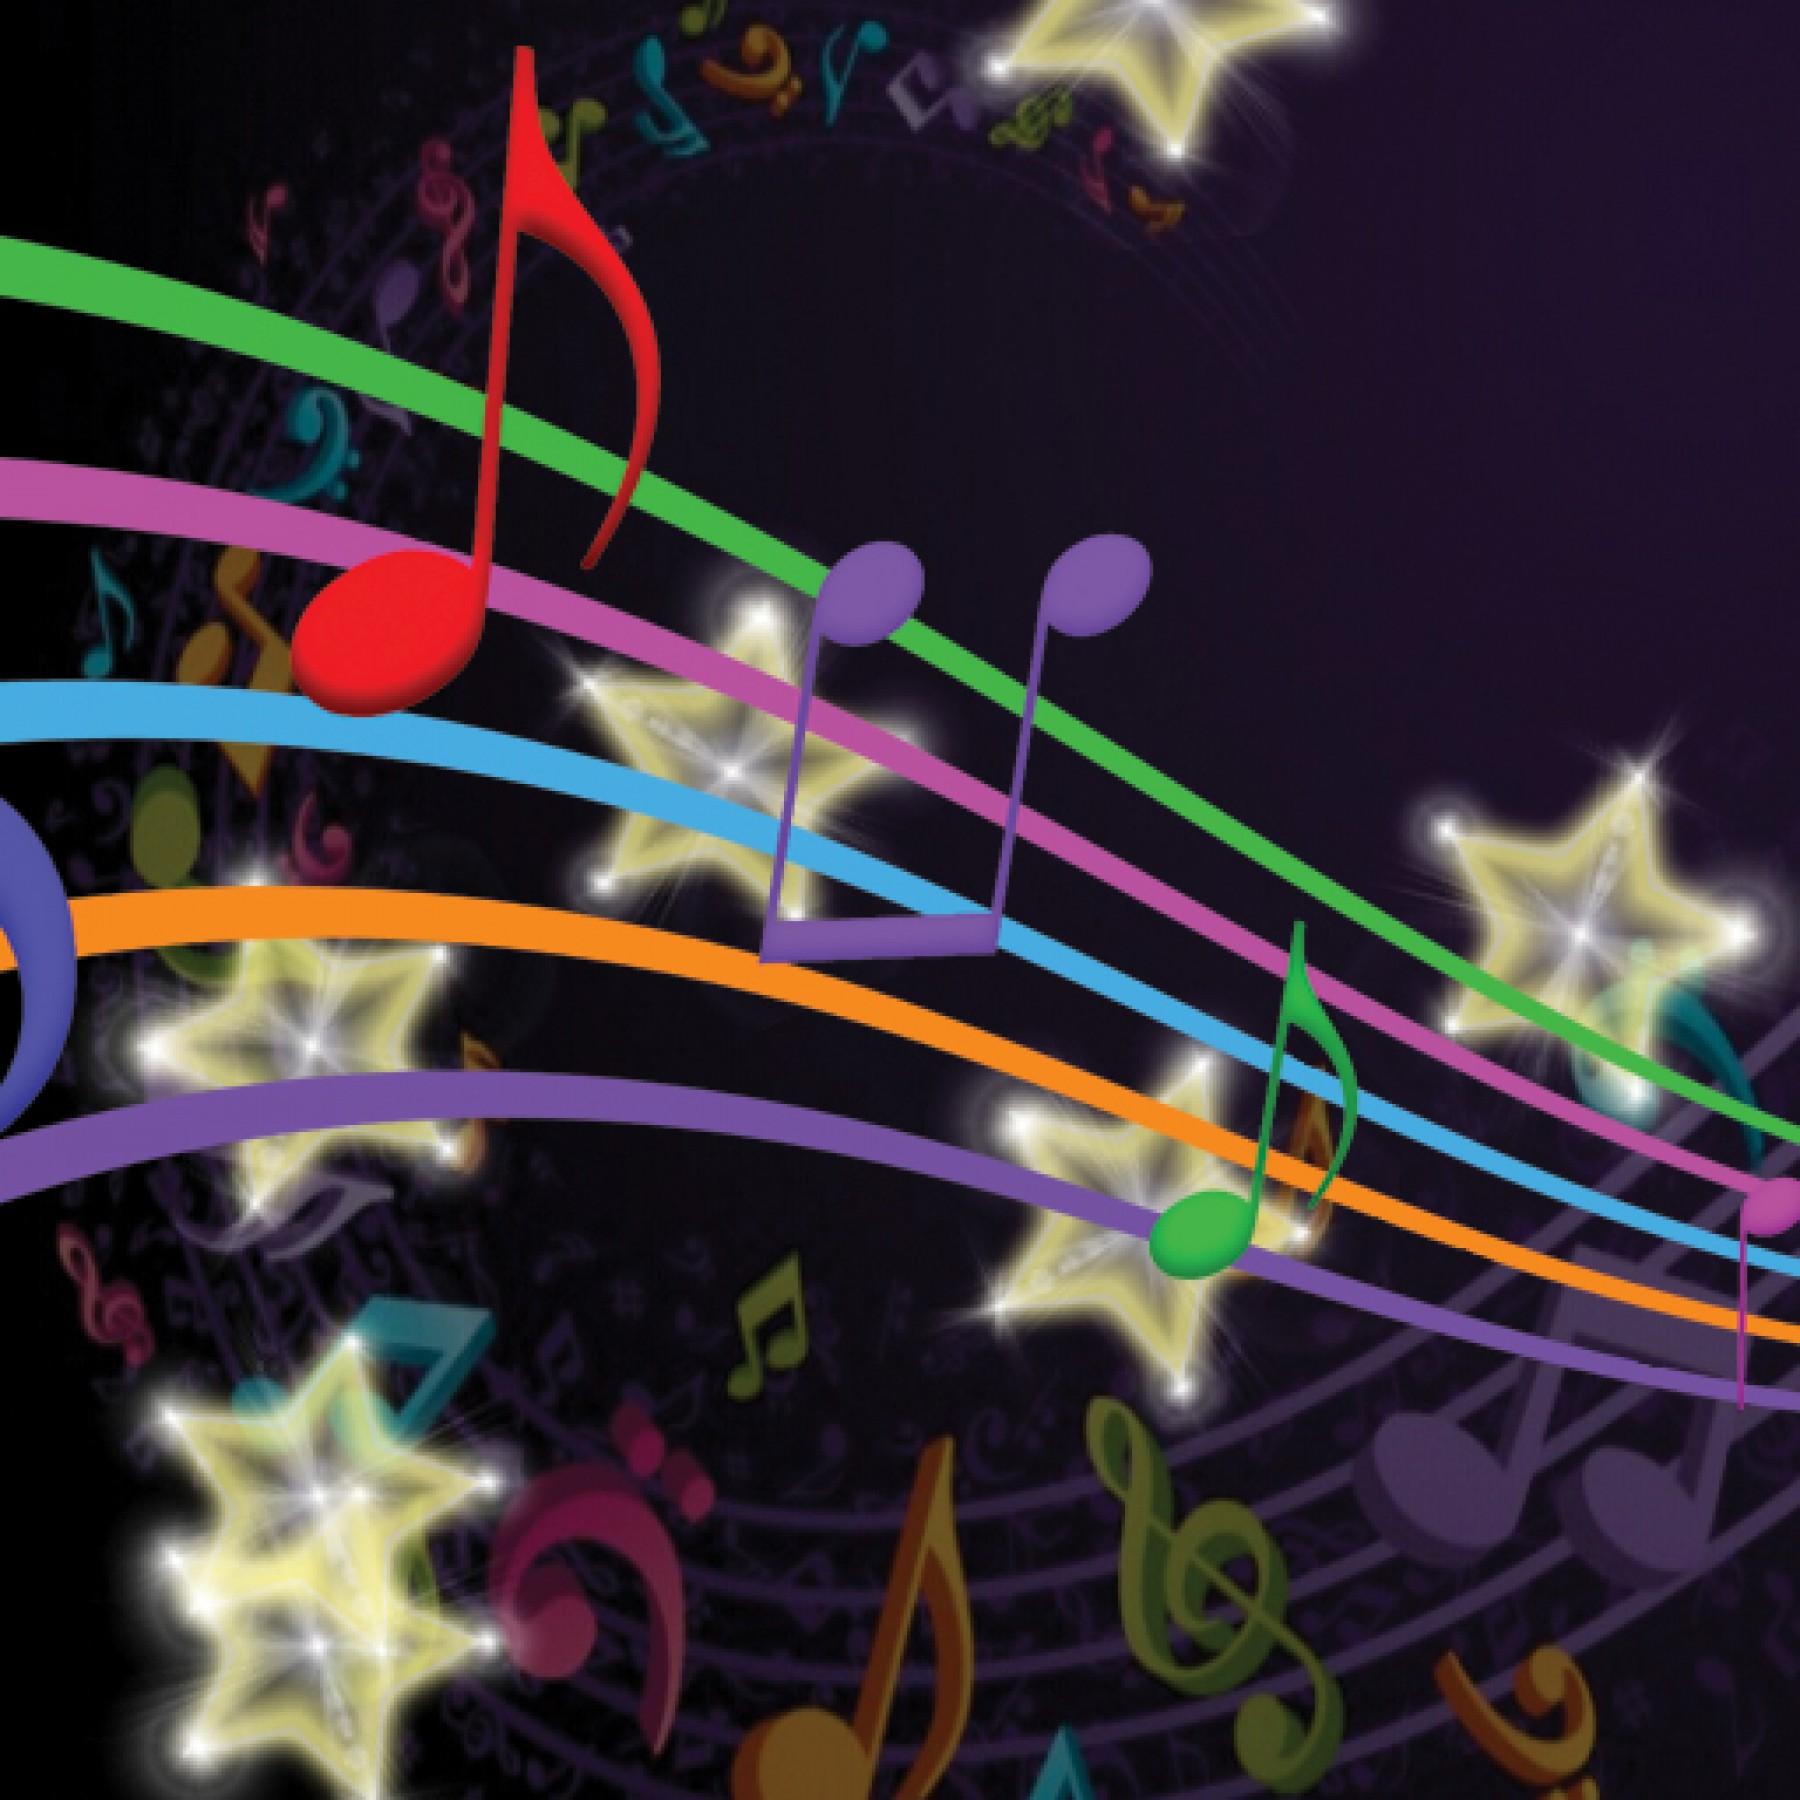 twinkle-twinkle-music-kids-adults-sensory-main-location1